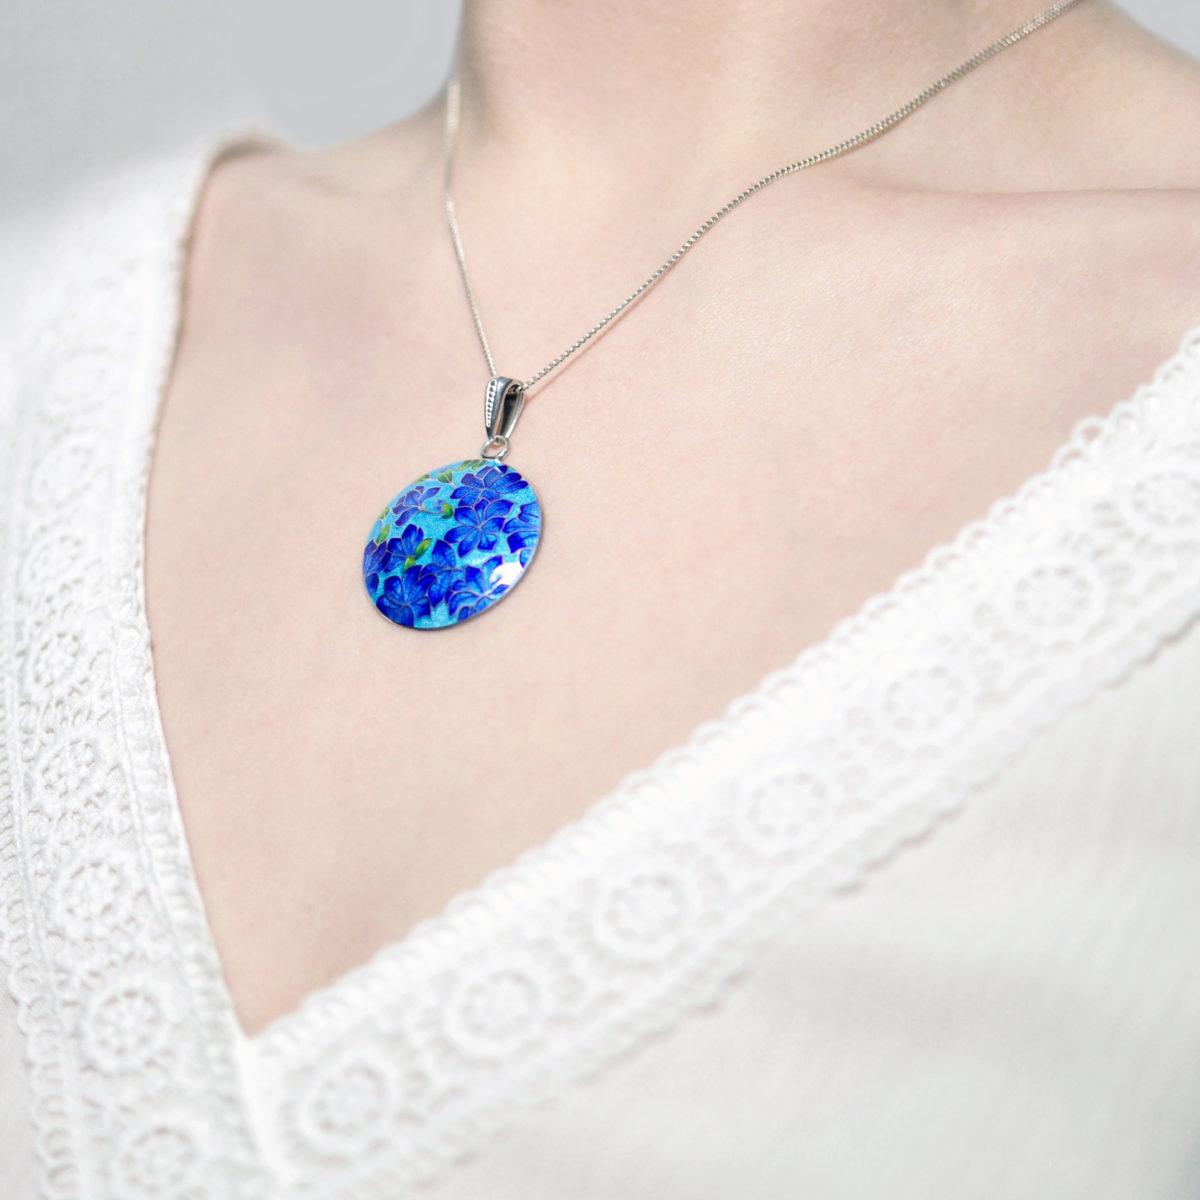 Serebro golubaya 3 1200x1200 - Подвеска «Клематис», сине-голубая